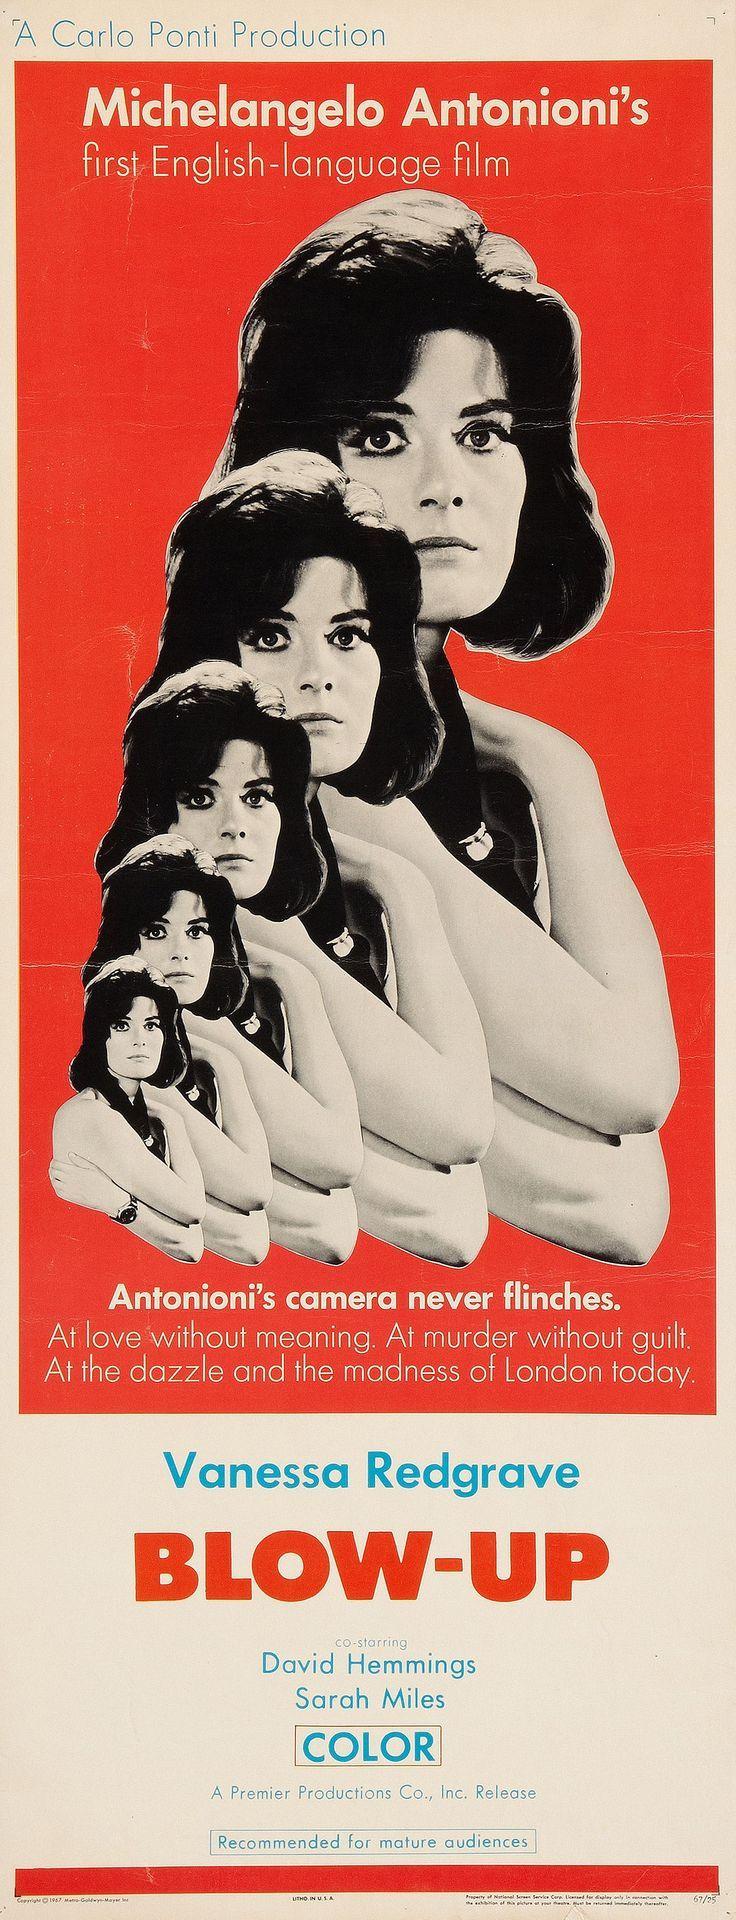 Poster design tumblr - Http Taegurk123 Tumblr Com Post 88847107794 Michelangelo Antonionivintage Postersdesign